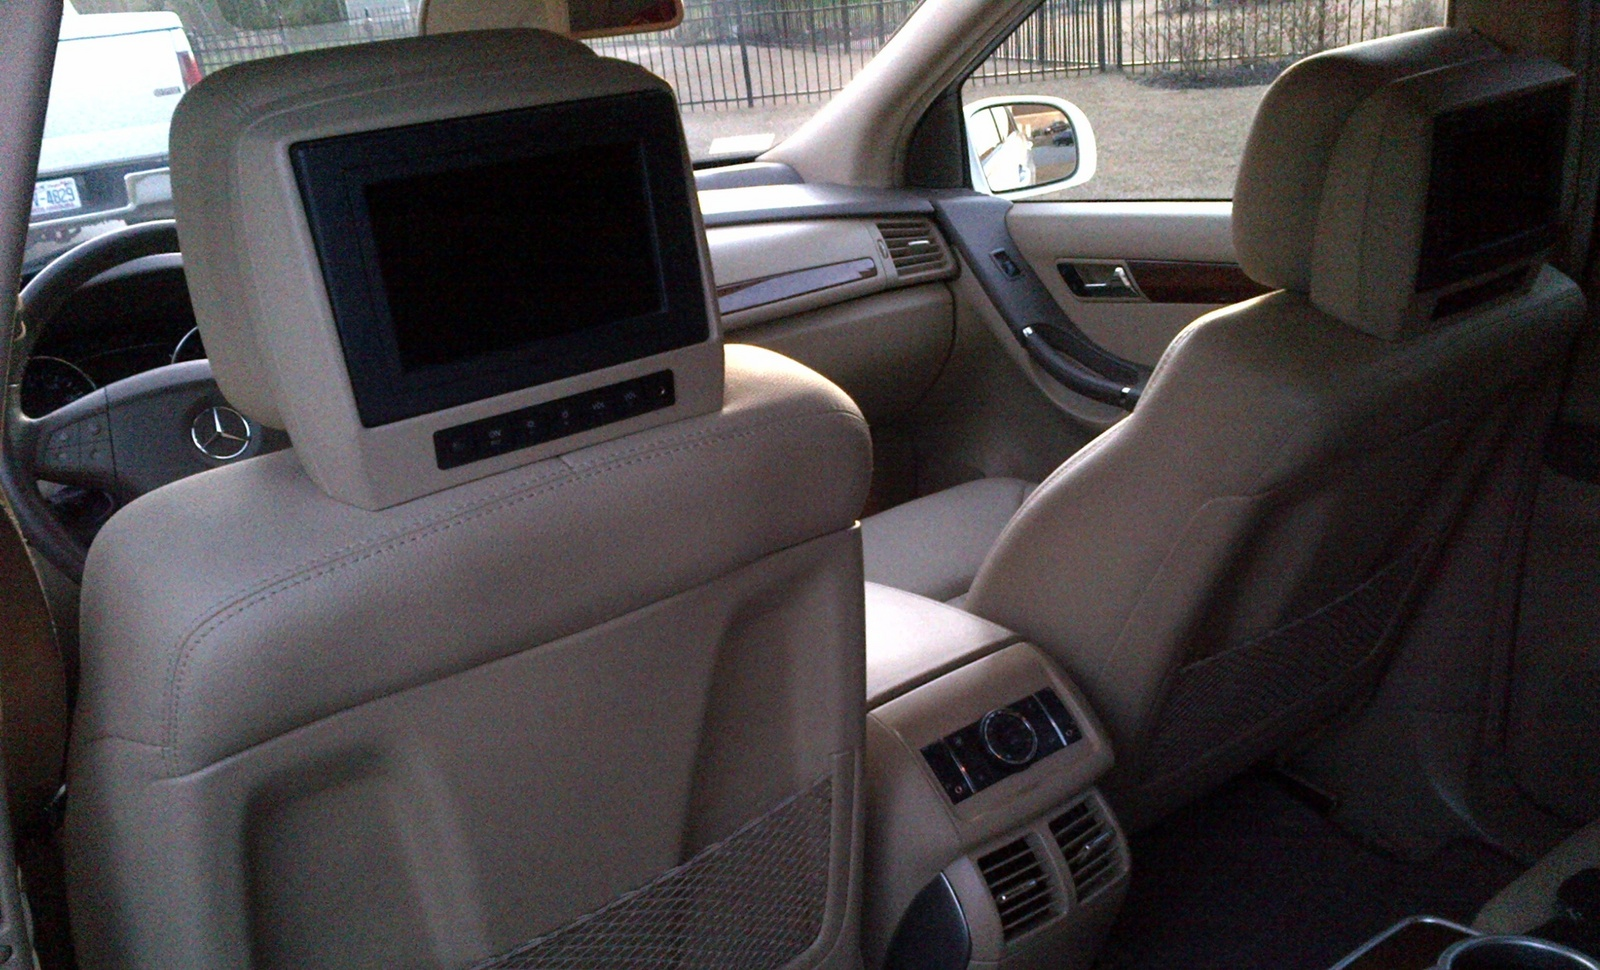 2007 Mercedes-Benz R-Class - Pictures - CarGurus